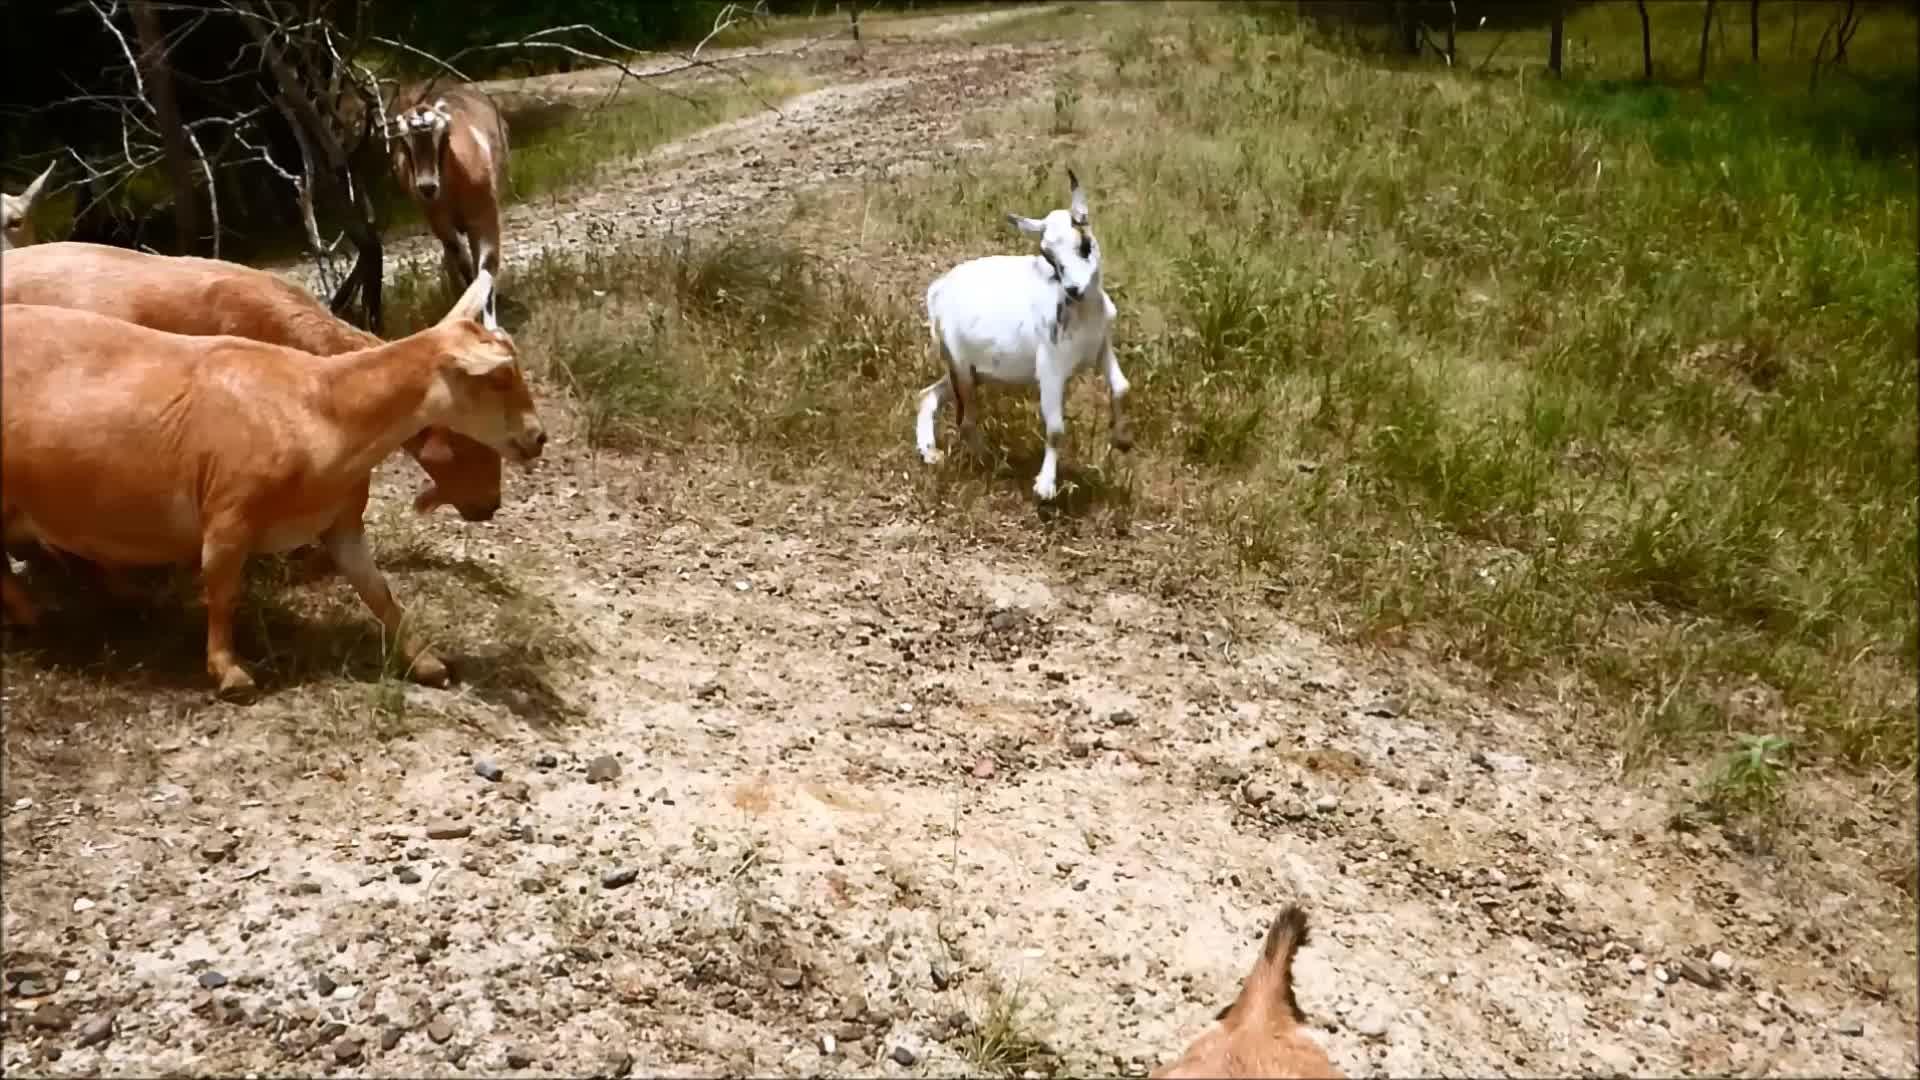 cute, eyebleach, funny, goat, goat parkour, goatparkour, happy, knsfarm, parkour, Spin Jump down the Hill GIFs